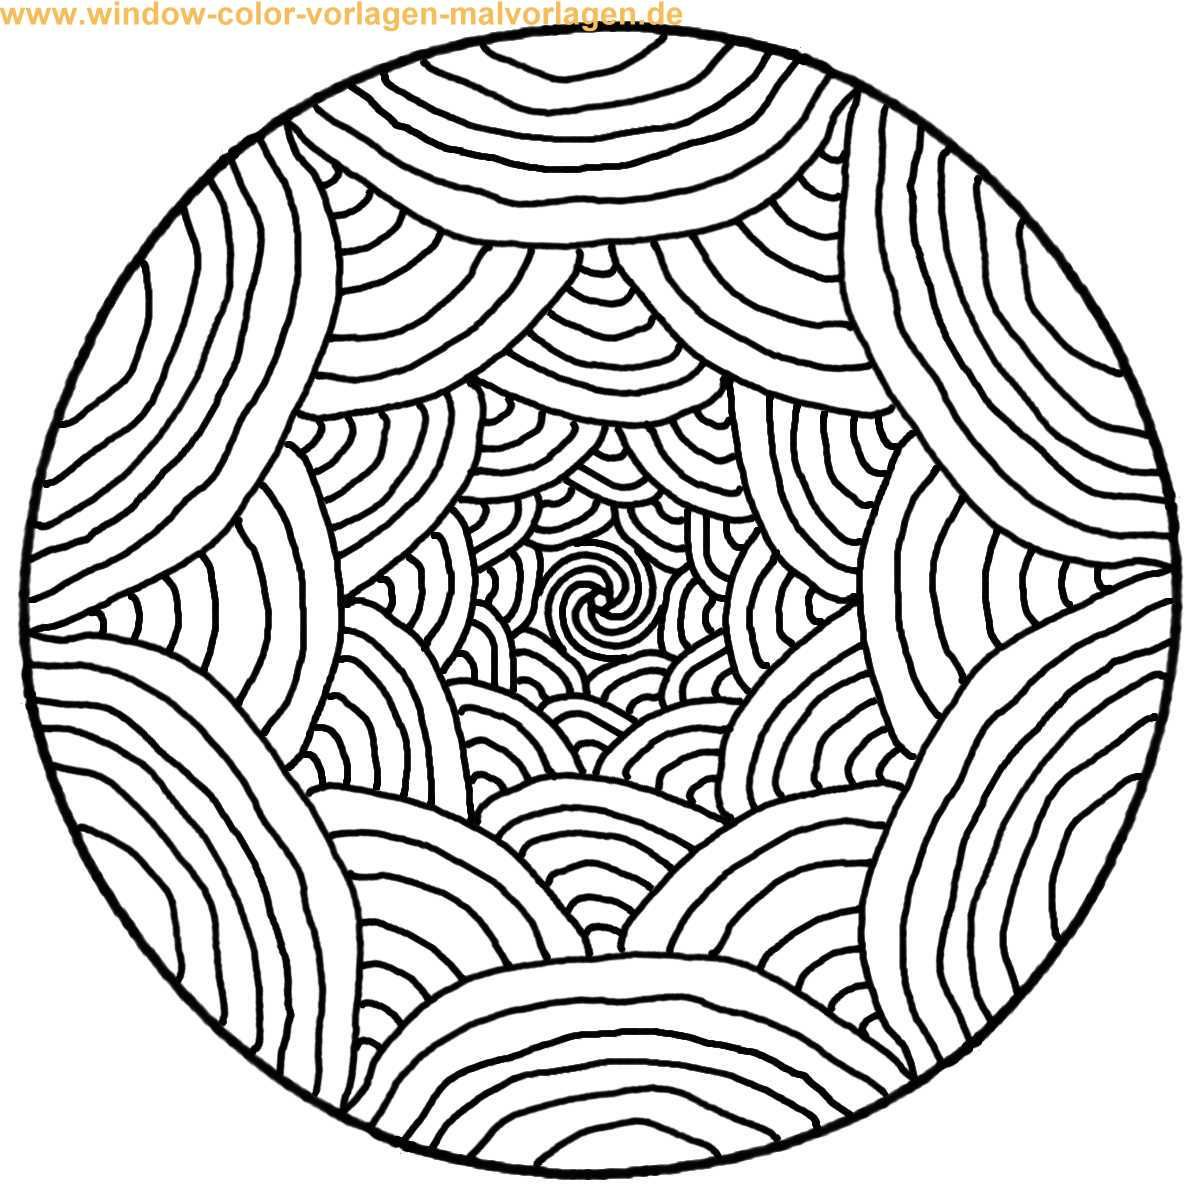 Mandalas to print and color Malvorlage Ausmalbild